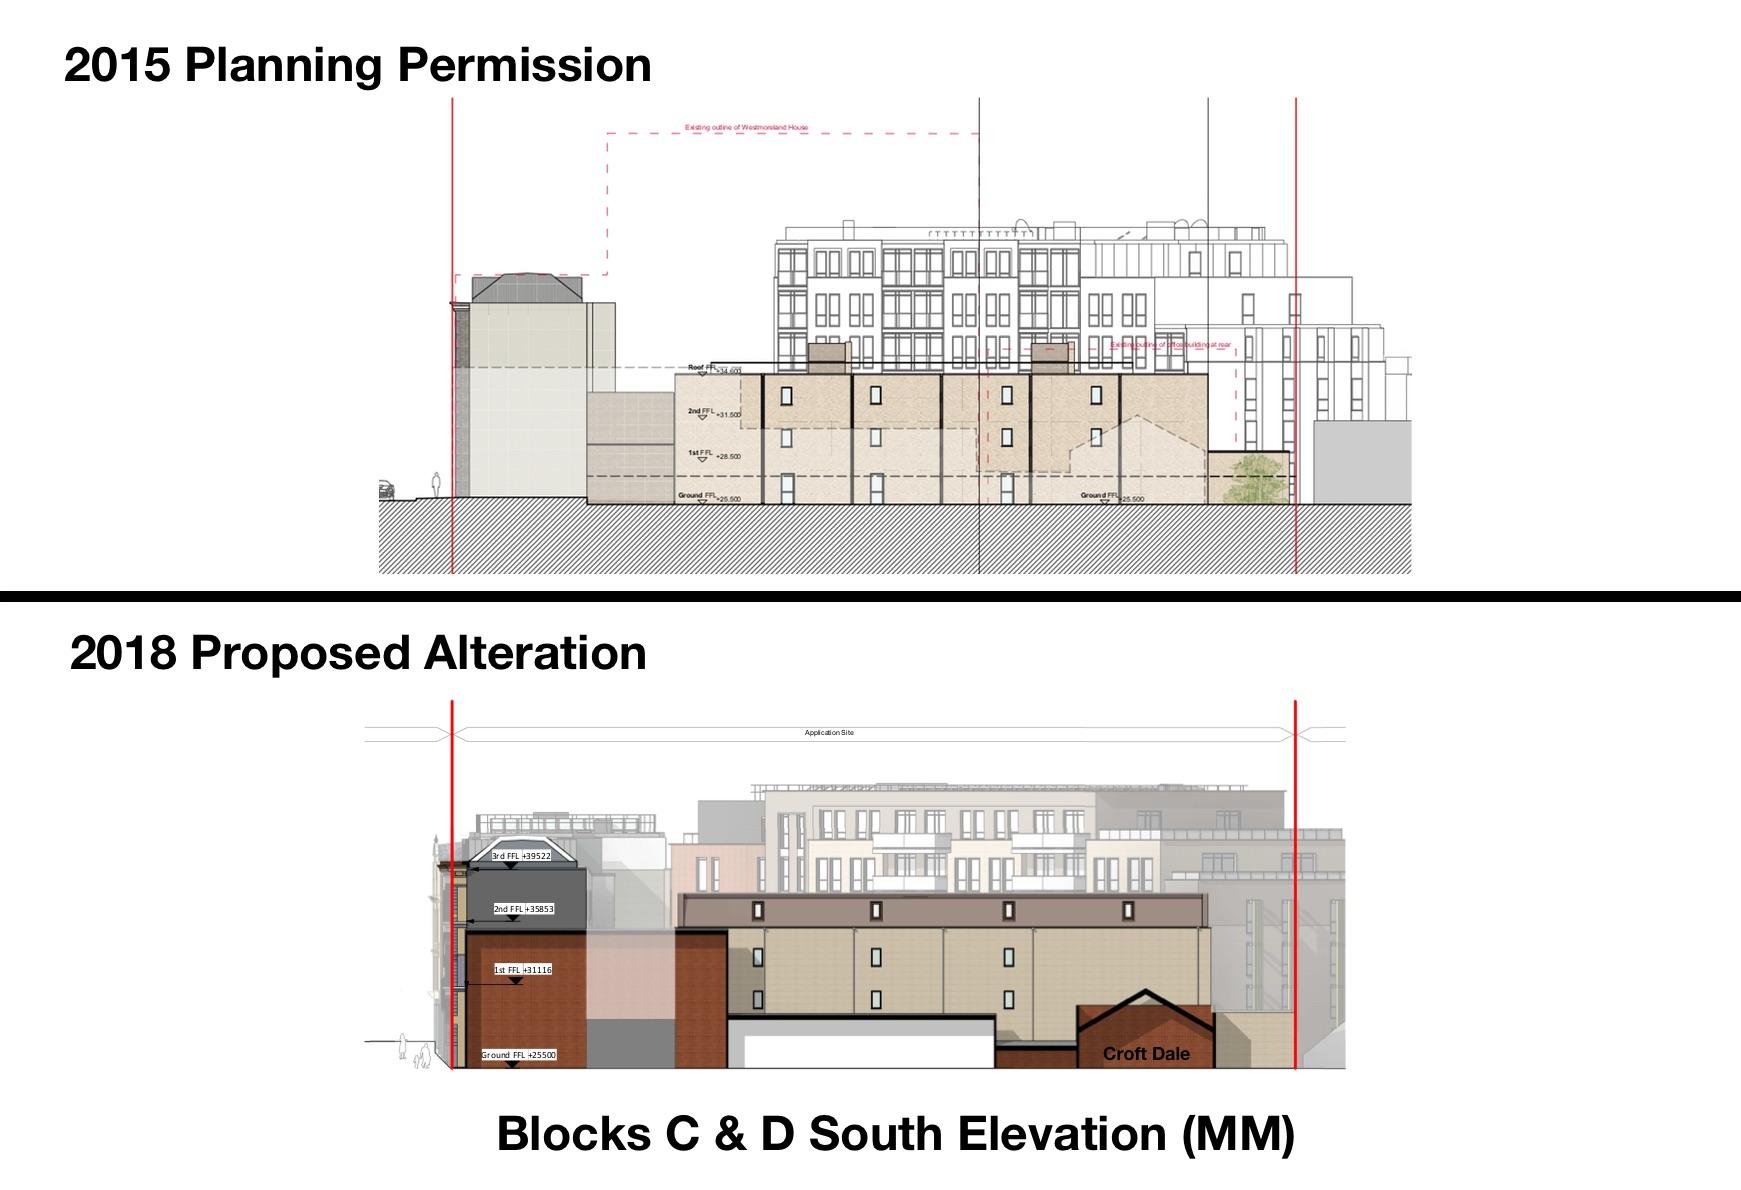 MM Blocks CD south elevation comparison.jpg